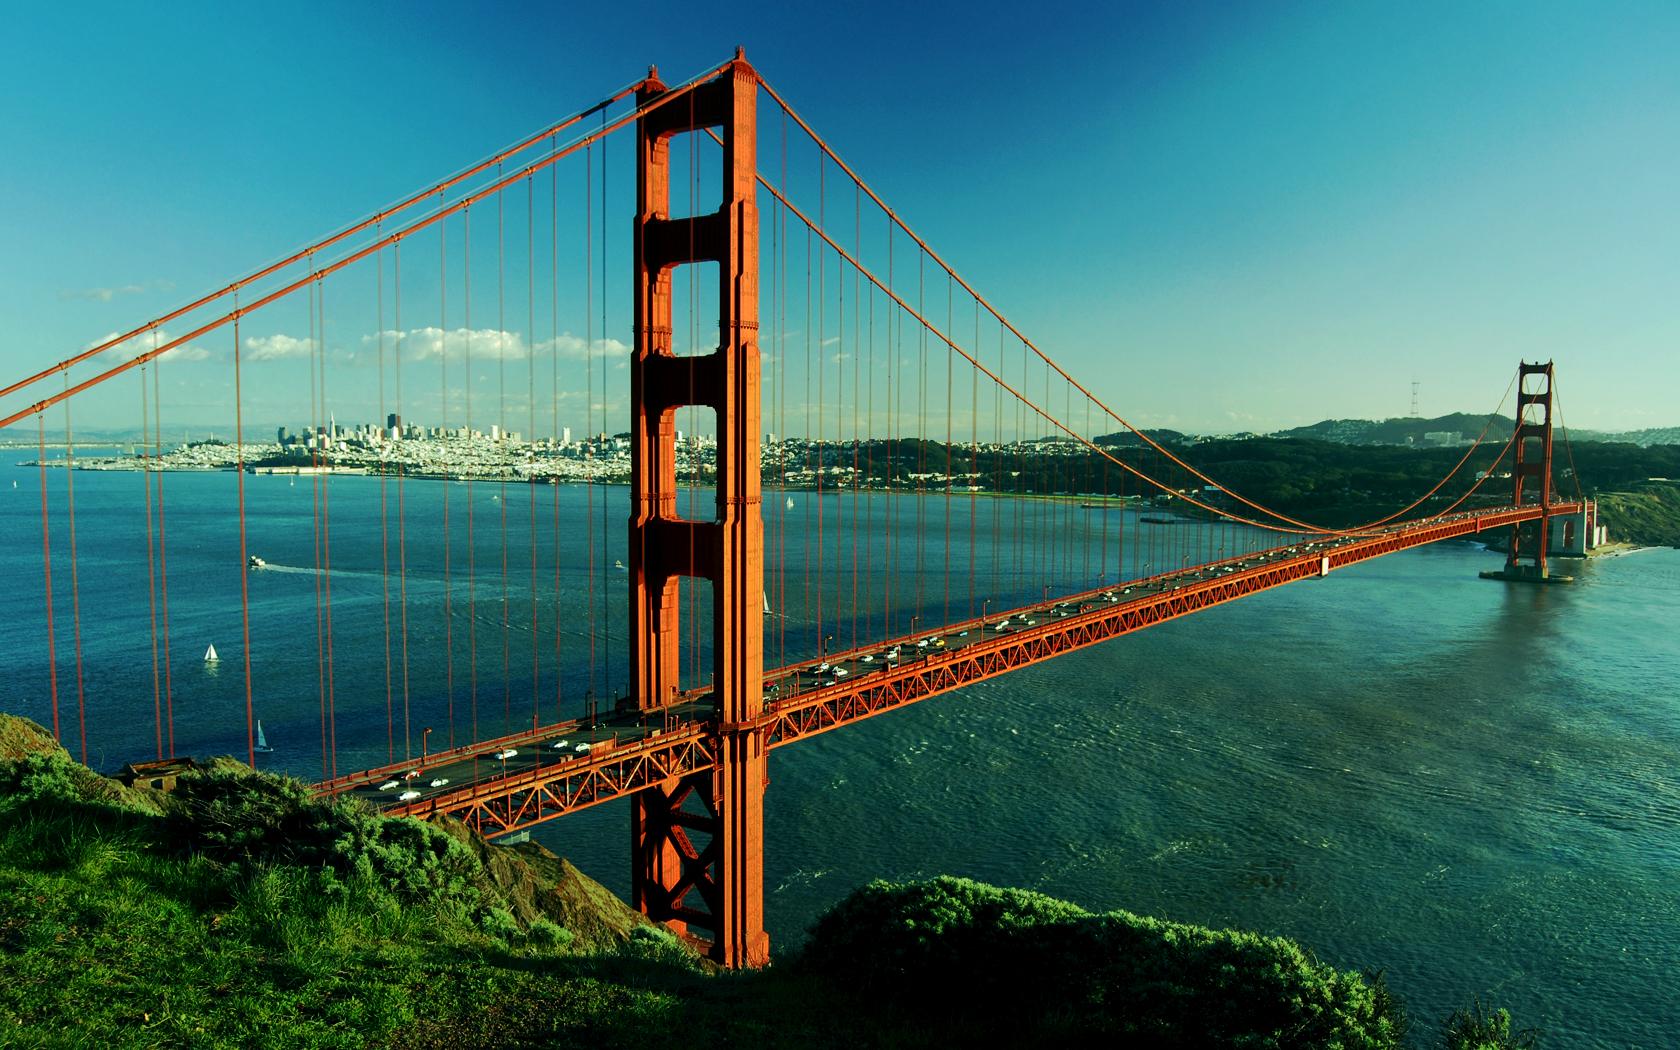 USA San Francisco Golden Gate by angelcostavillacrez